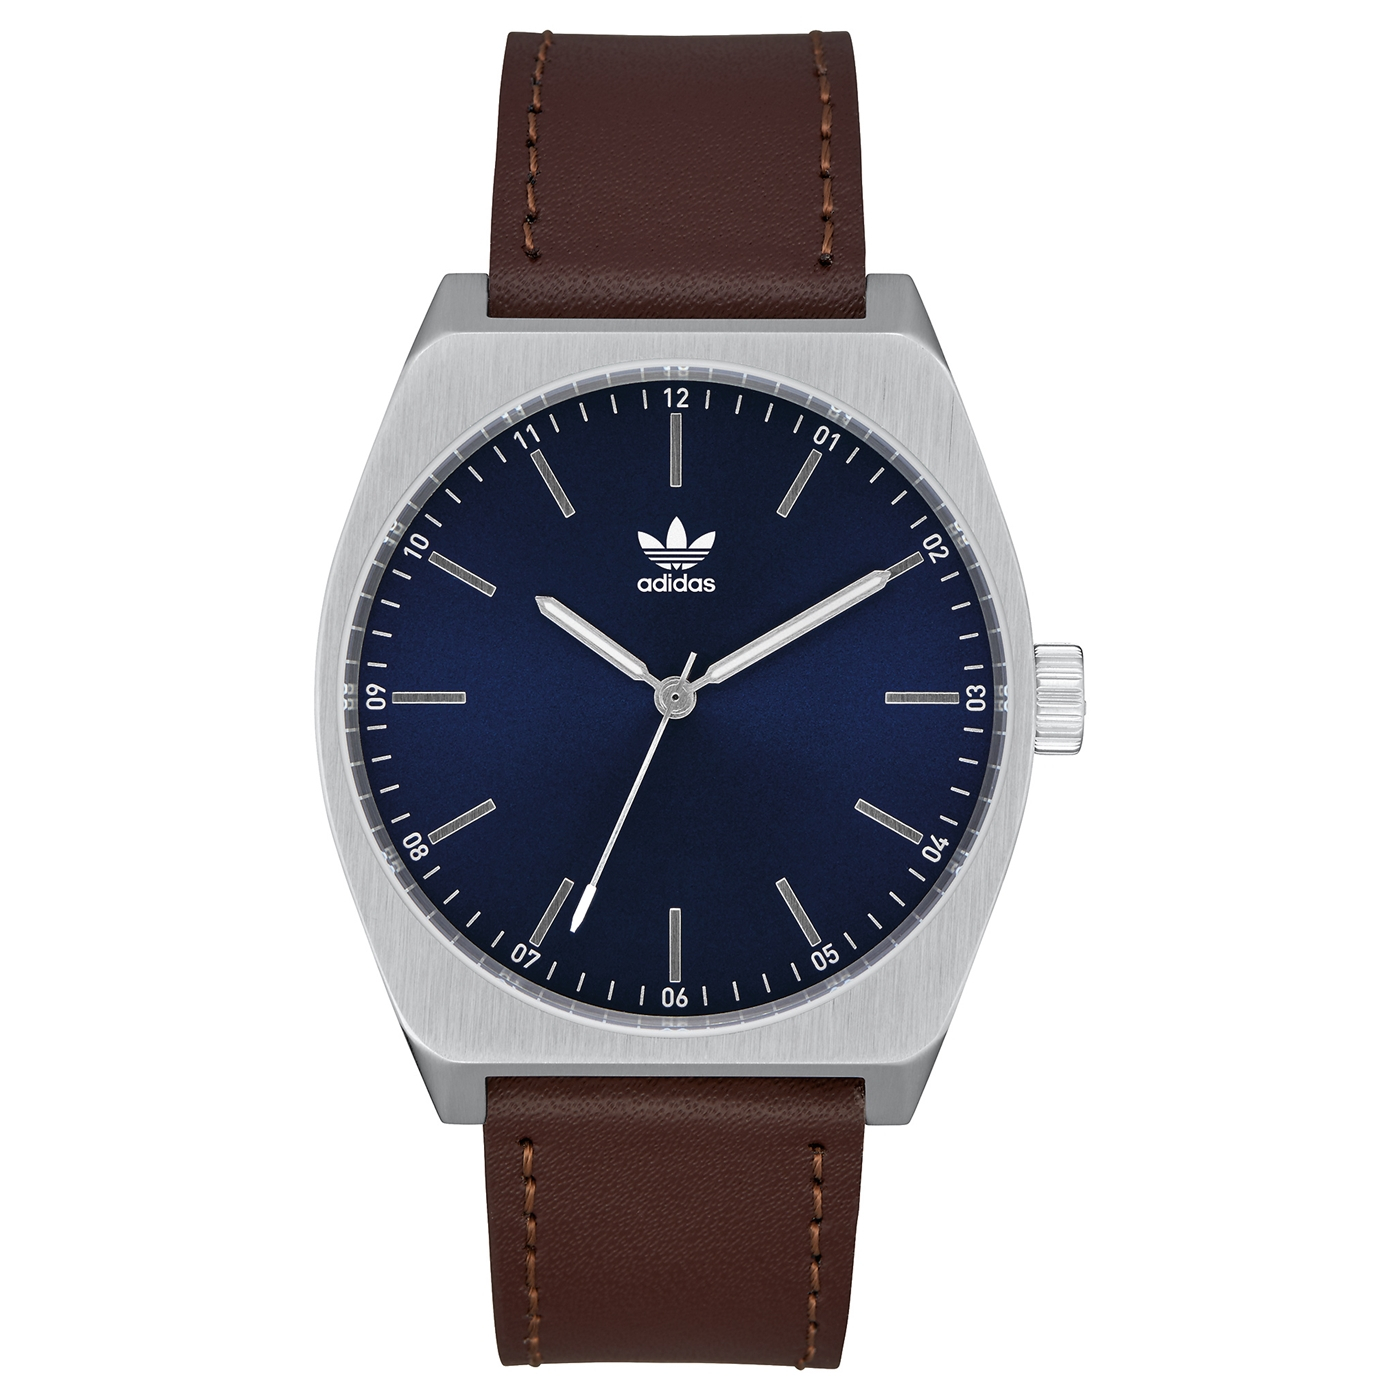 Bilde av Adidas Process watch Z05 2920 00